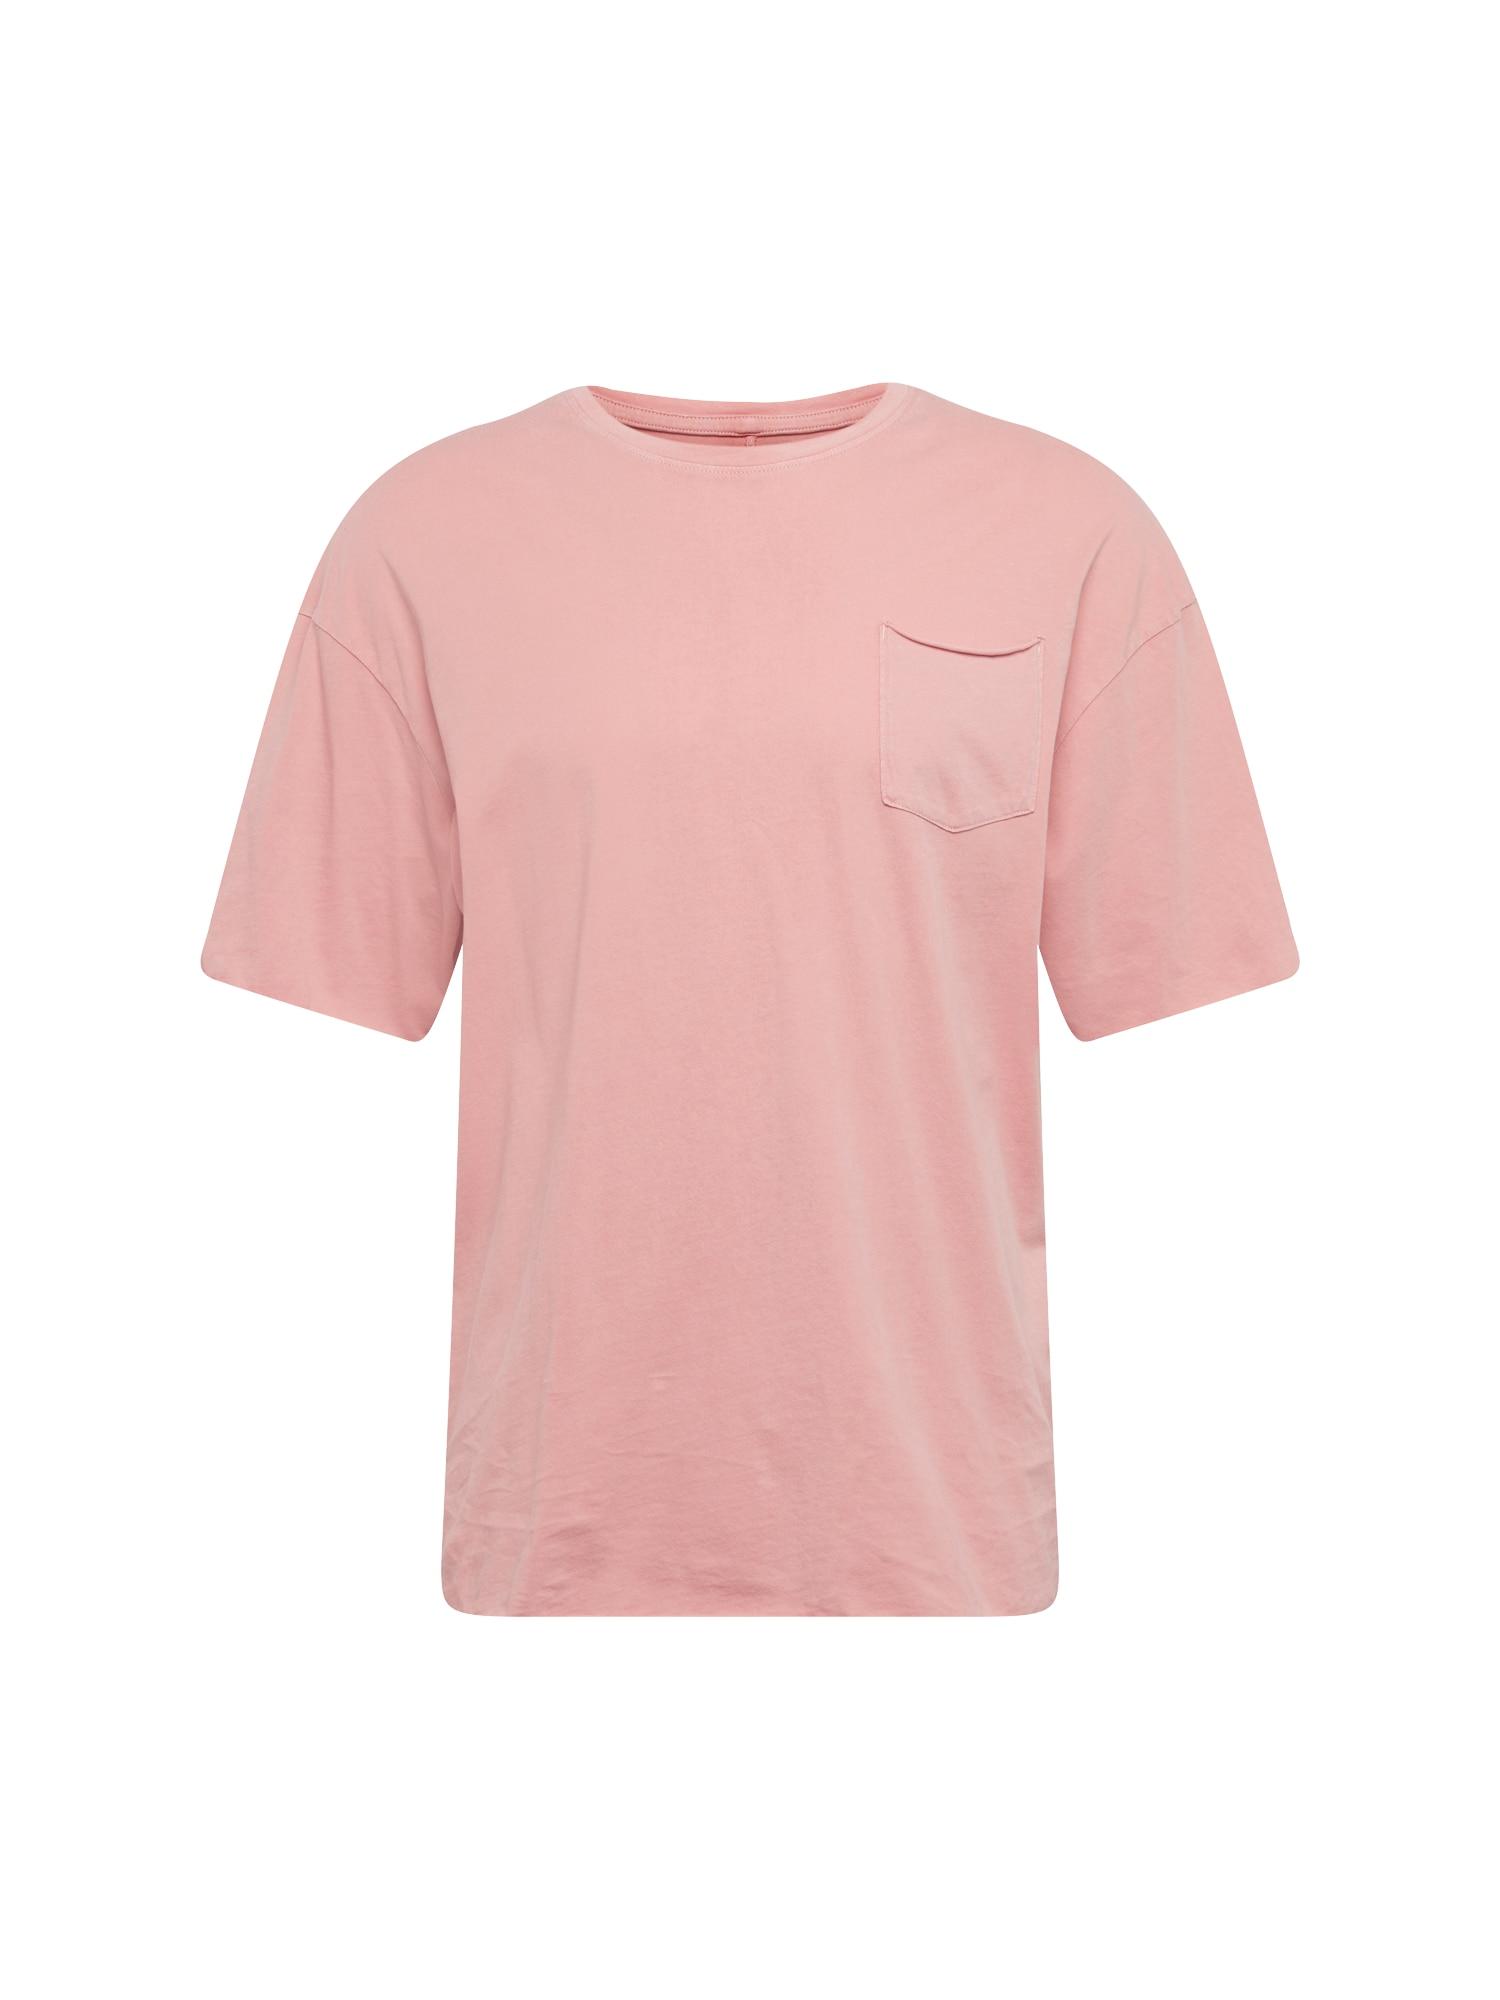 Tričko JORHOPPER růžová JACK & JONES